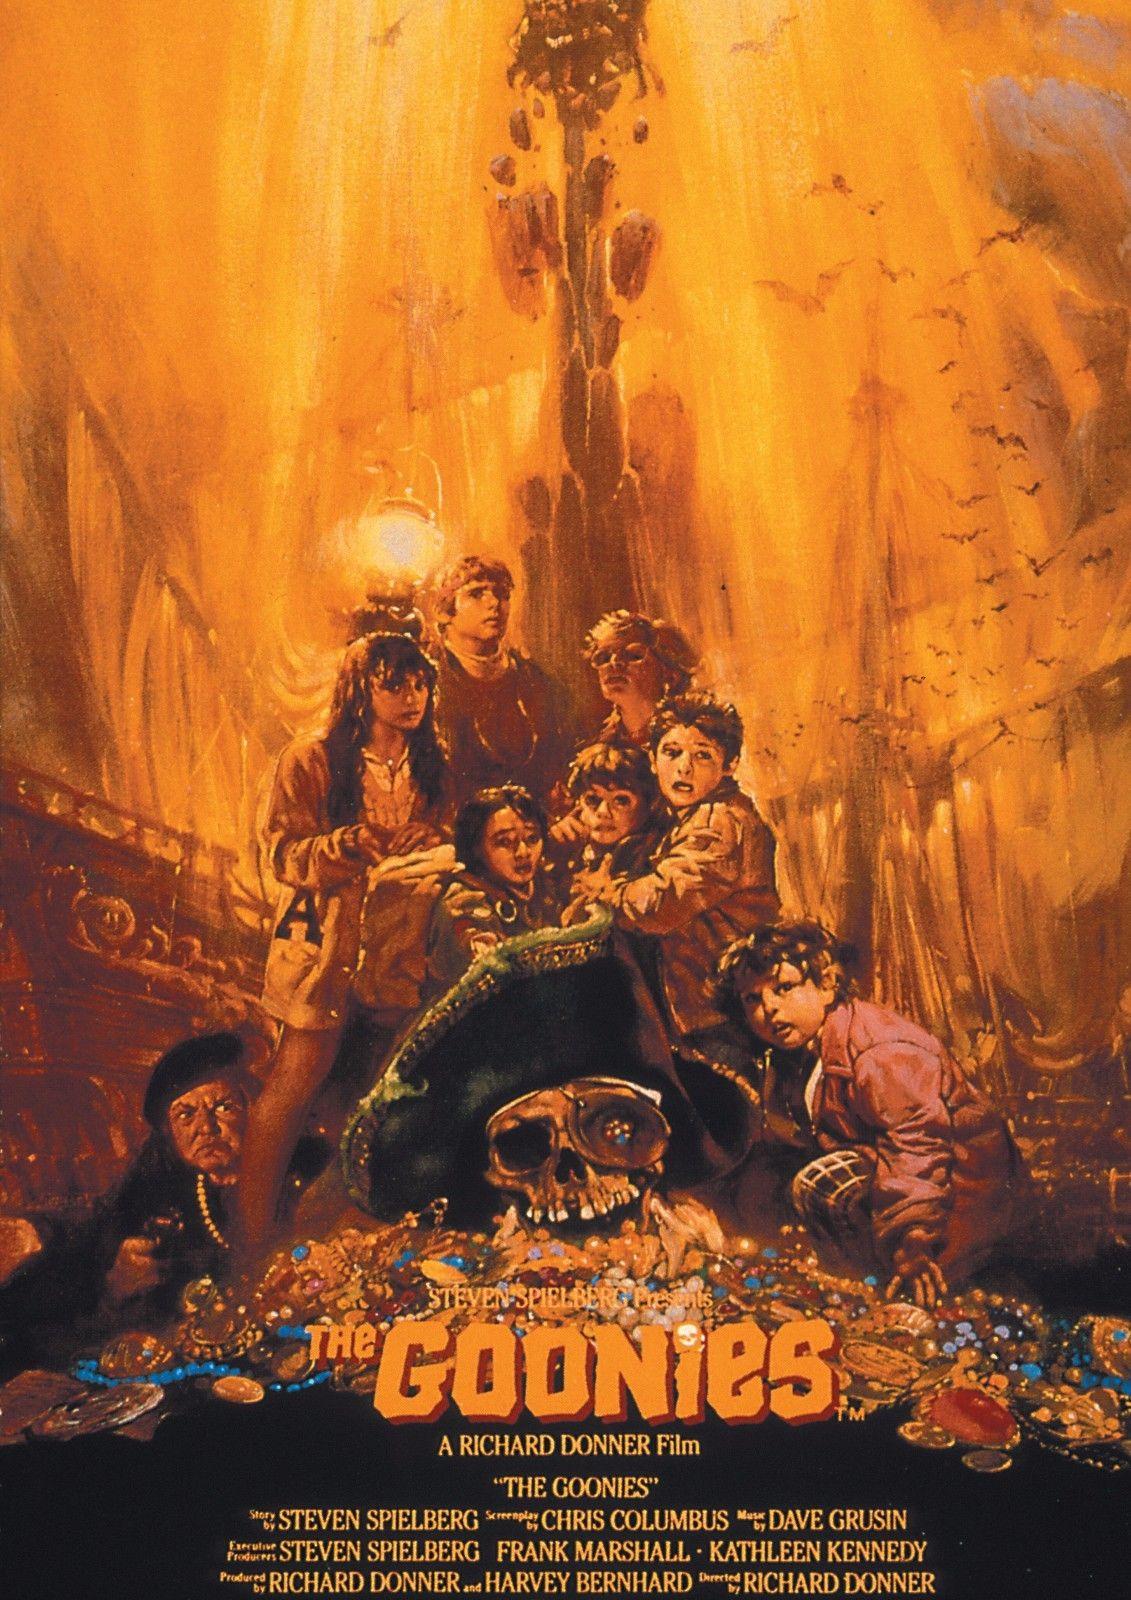 Goonies Movie Art Silk Poster 12x18 24x36